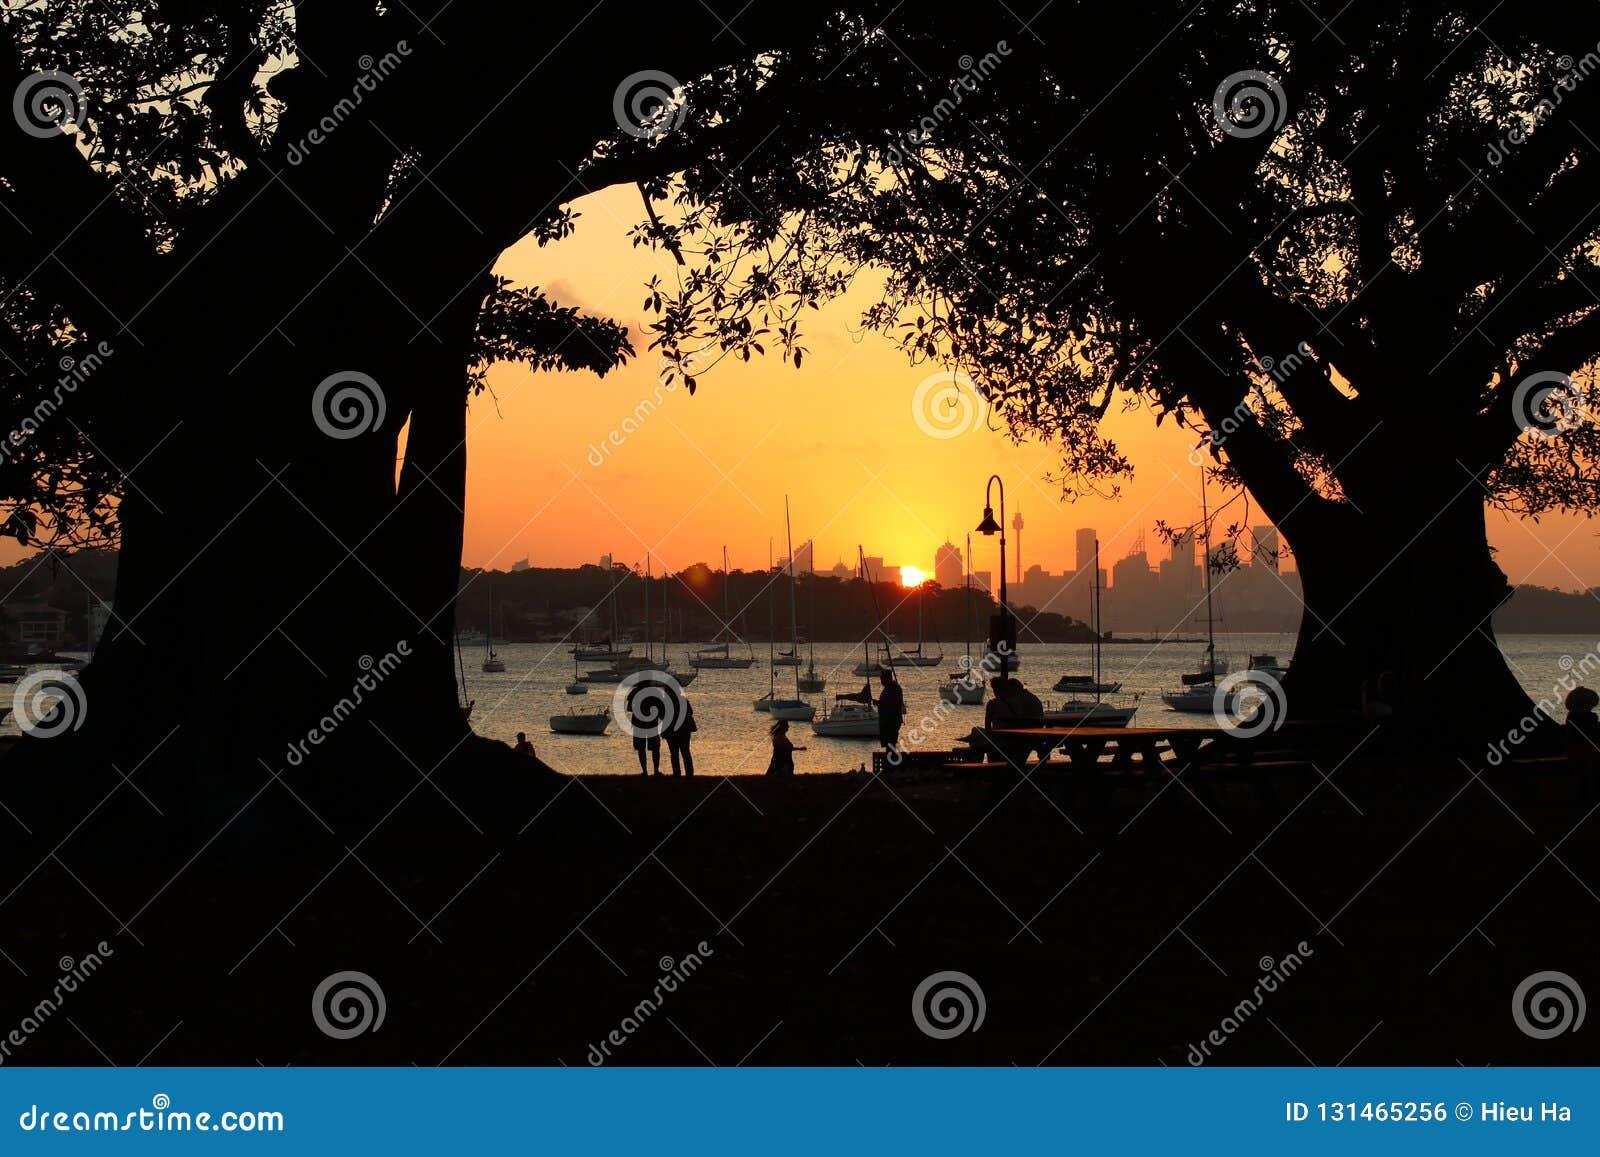 Orange Sunset at Watsons Bay in Sydney, New South Wales, Australia